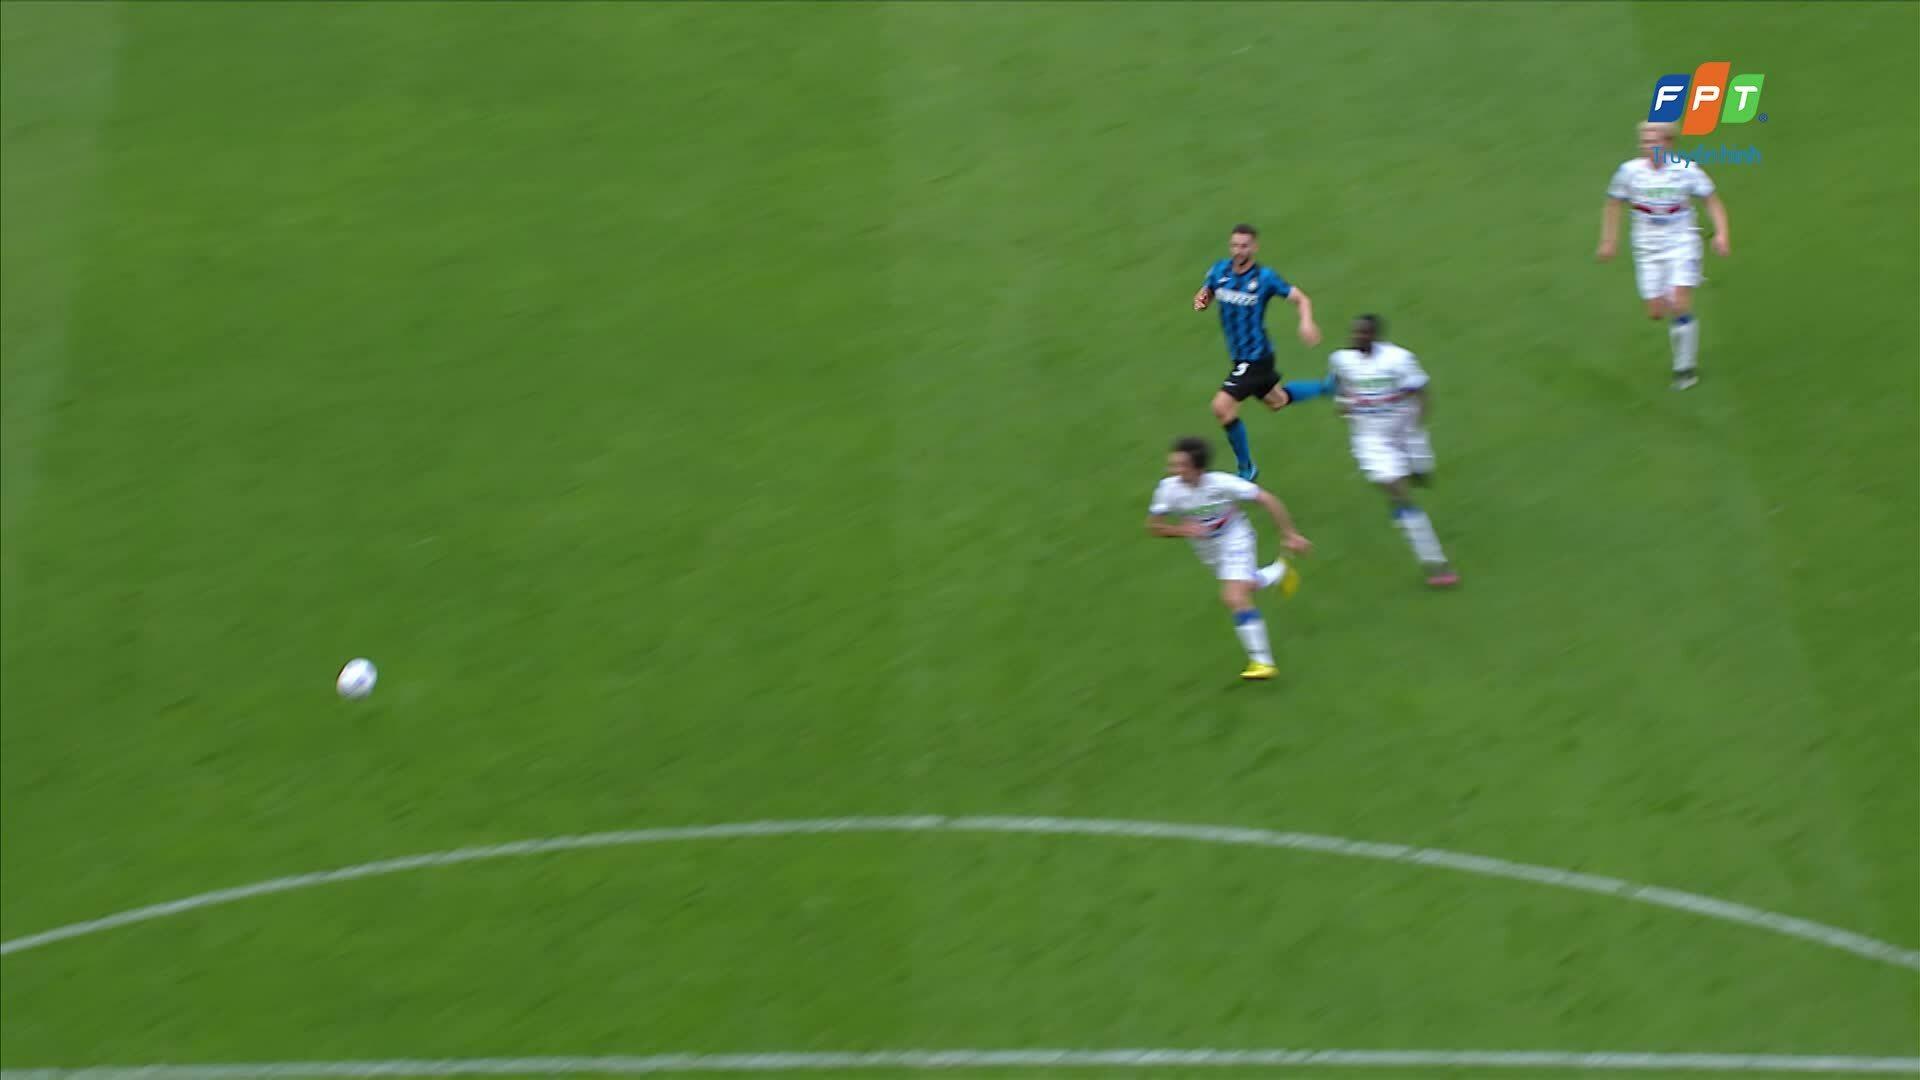 Inter 5-1 Sampdoria